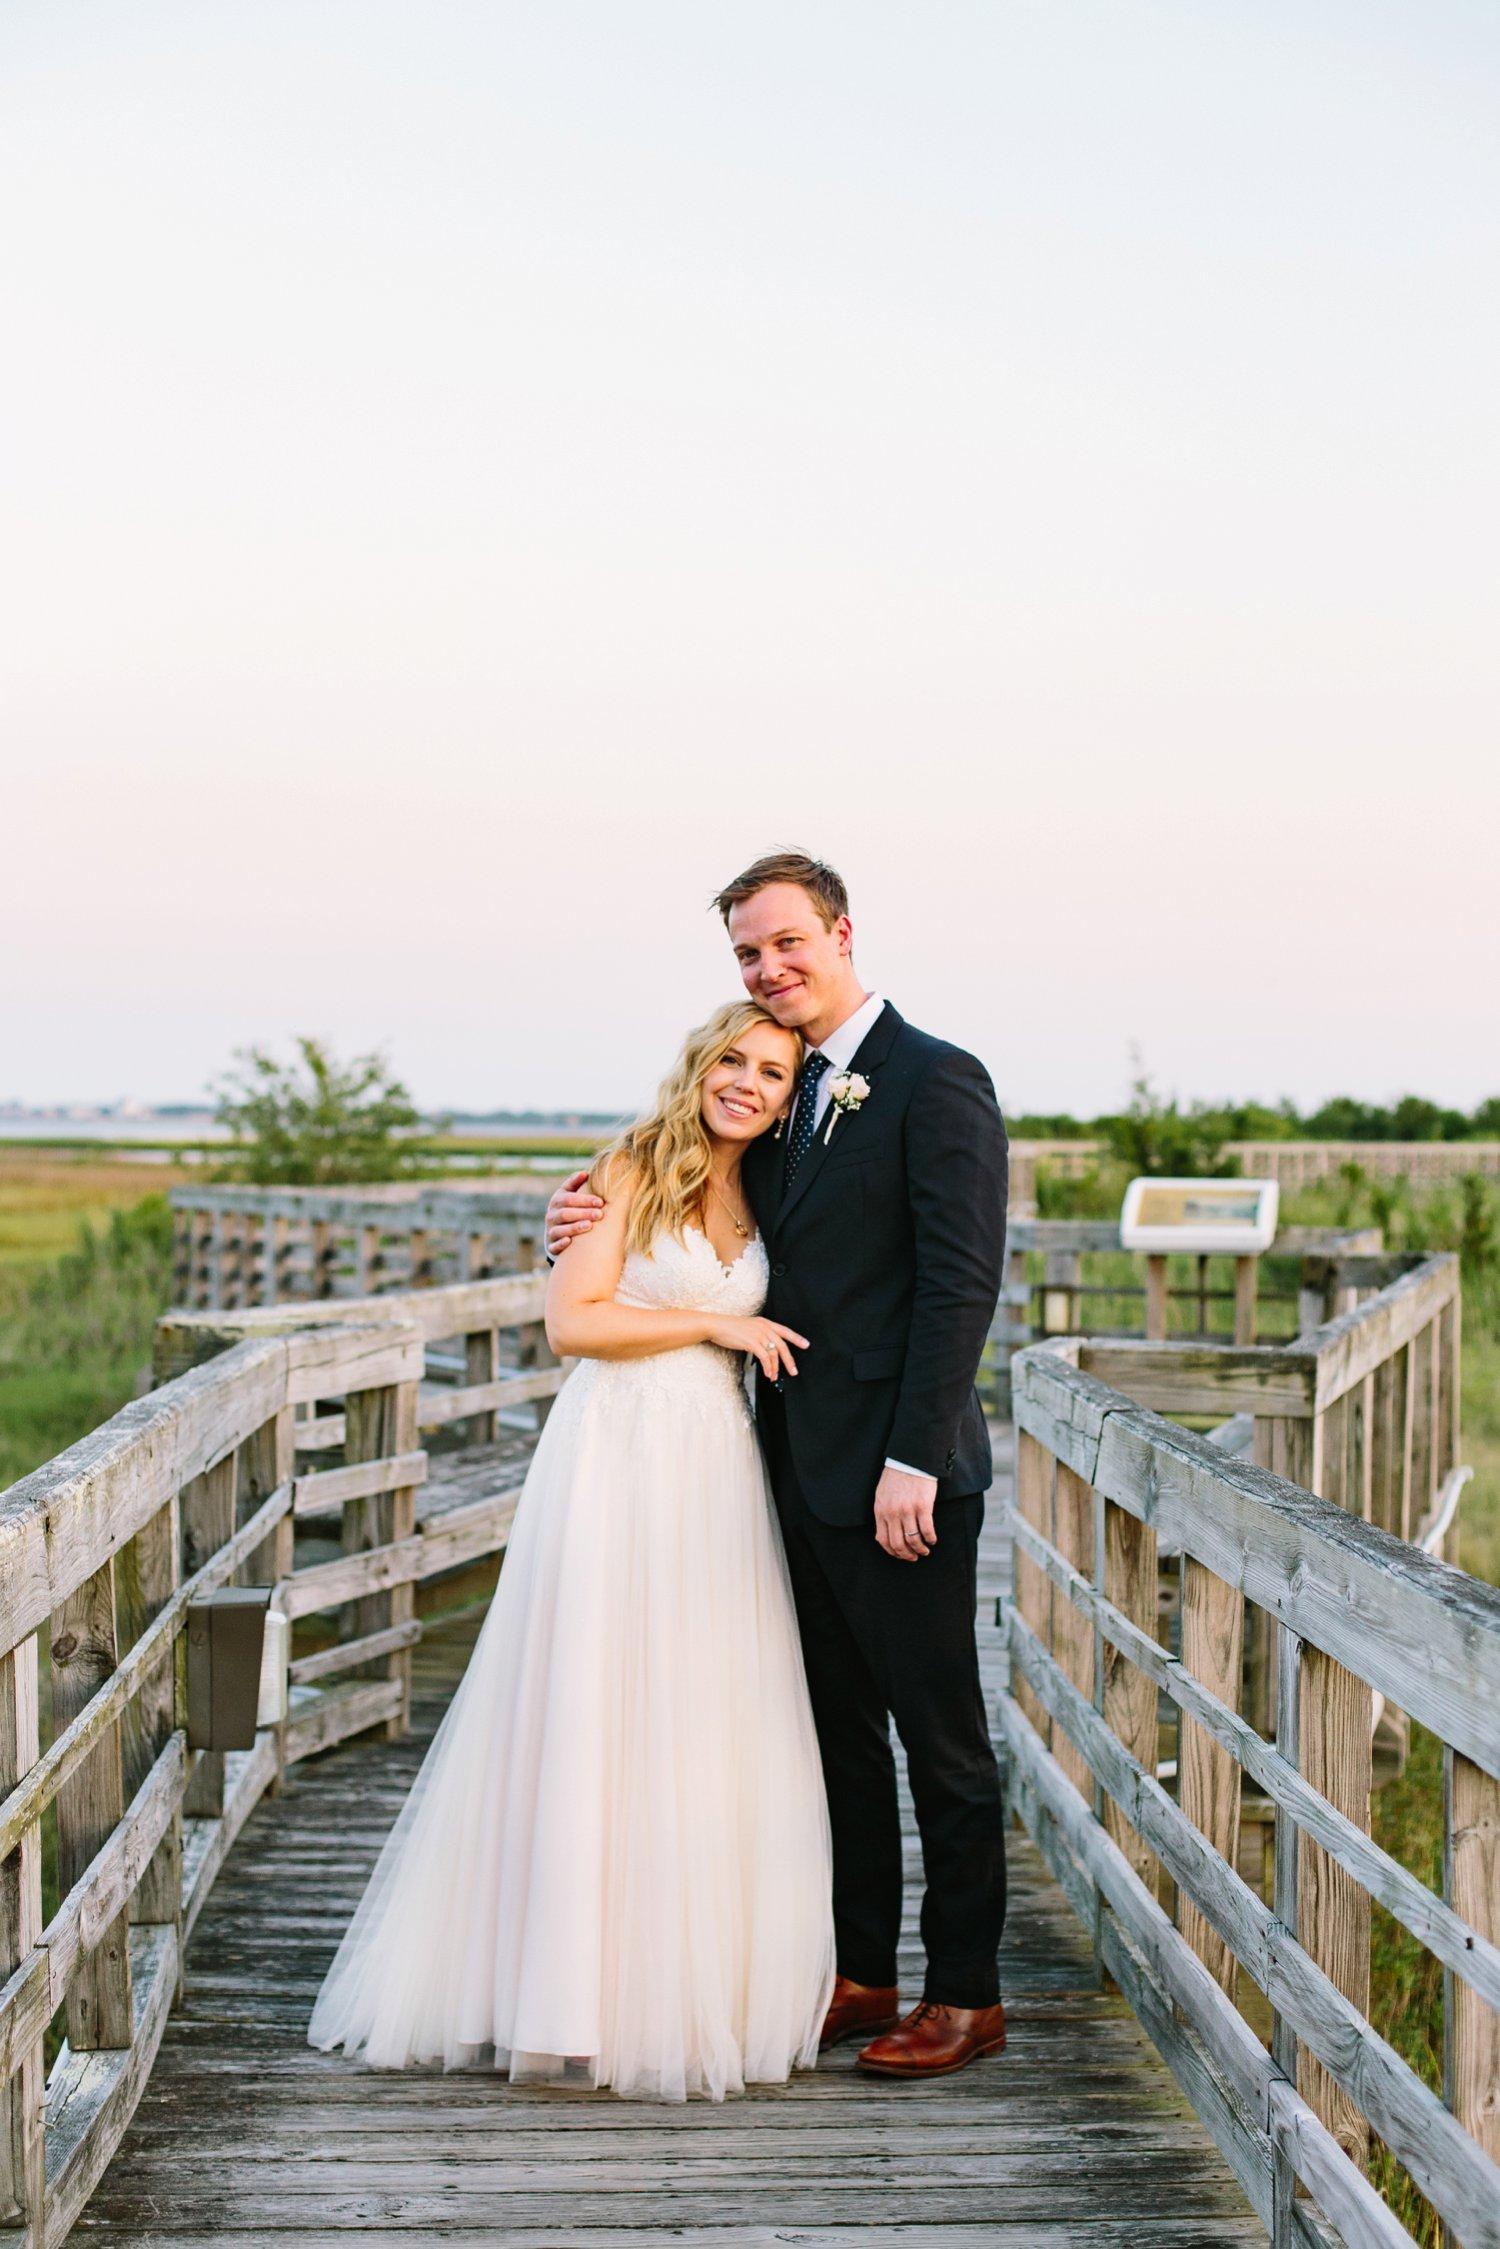 Lindsey_A_Miller_Photography_wedding_southport_community_building_bubbly_events_north_carolina_coasta_cannon_nautical_historic_060.jpg